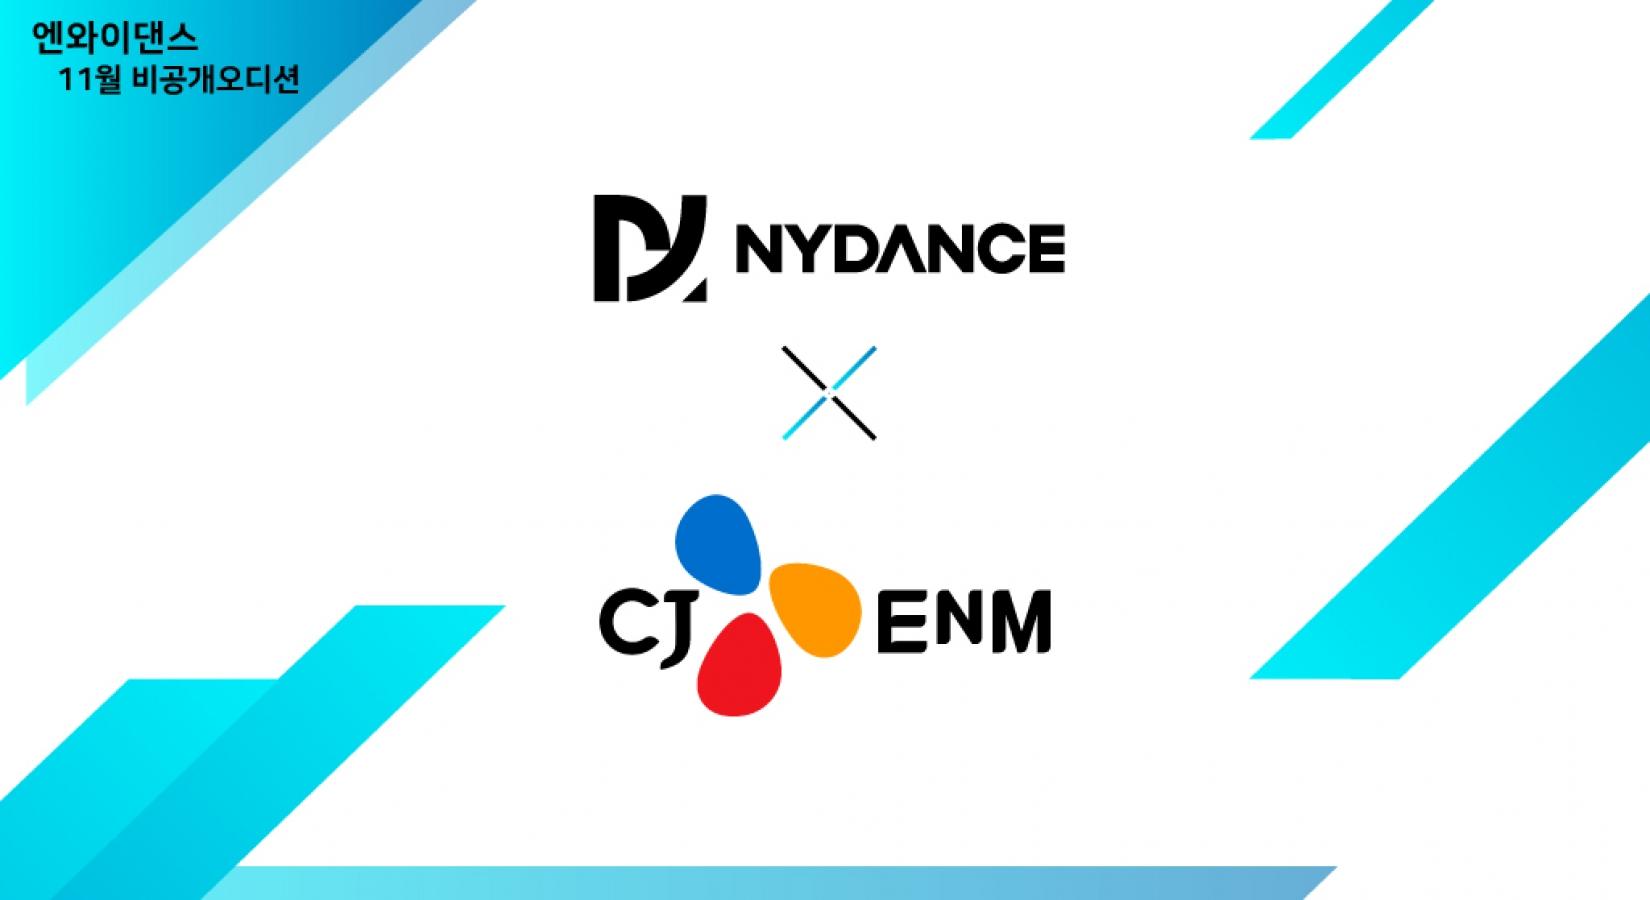 [NYDANCE] 2019년 11월 비공개 오디션 CJ E&M